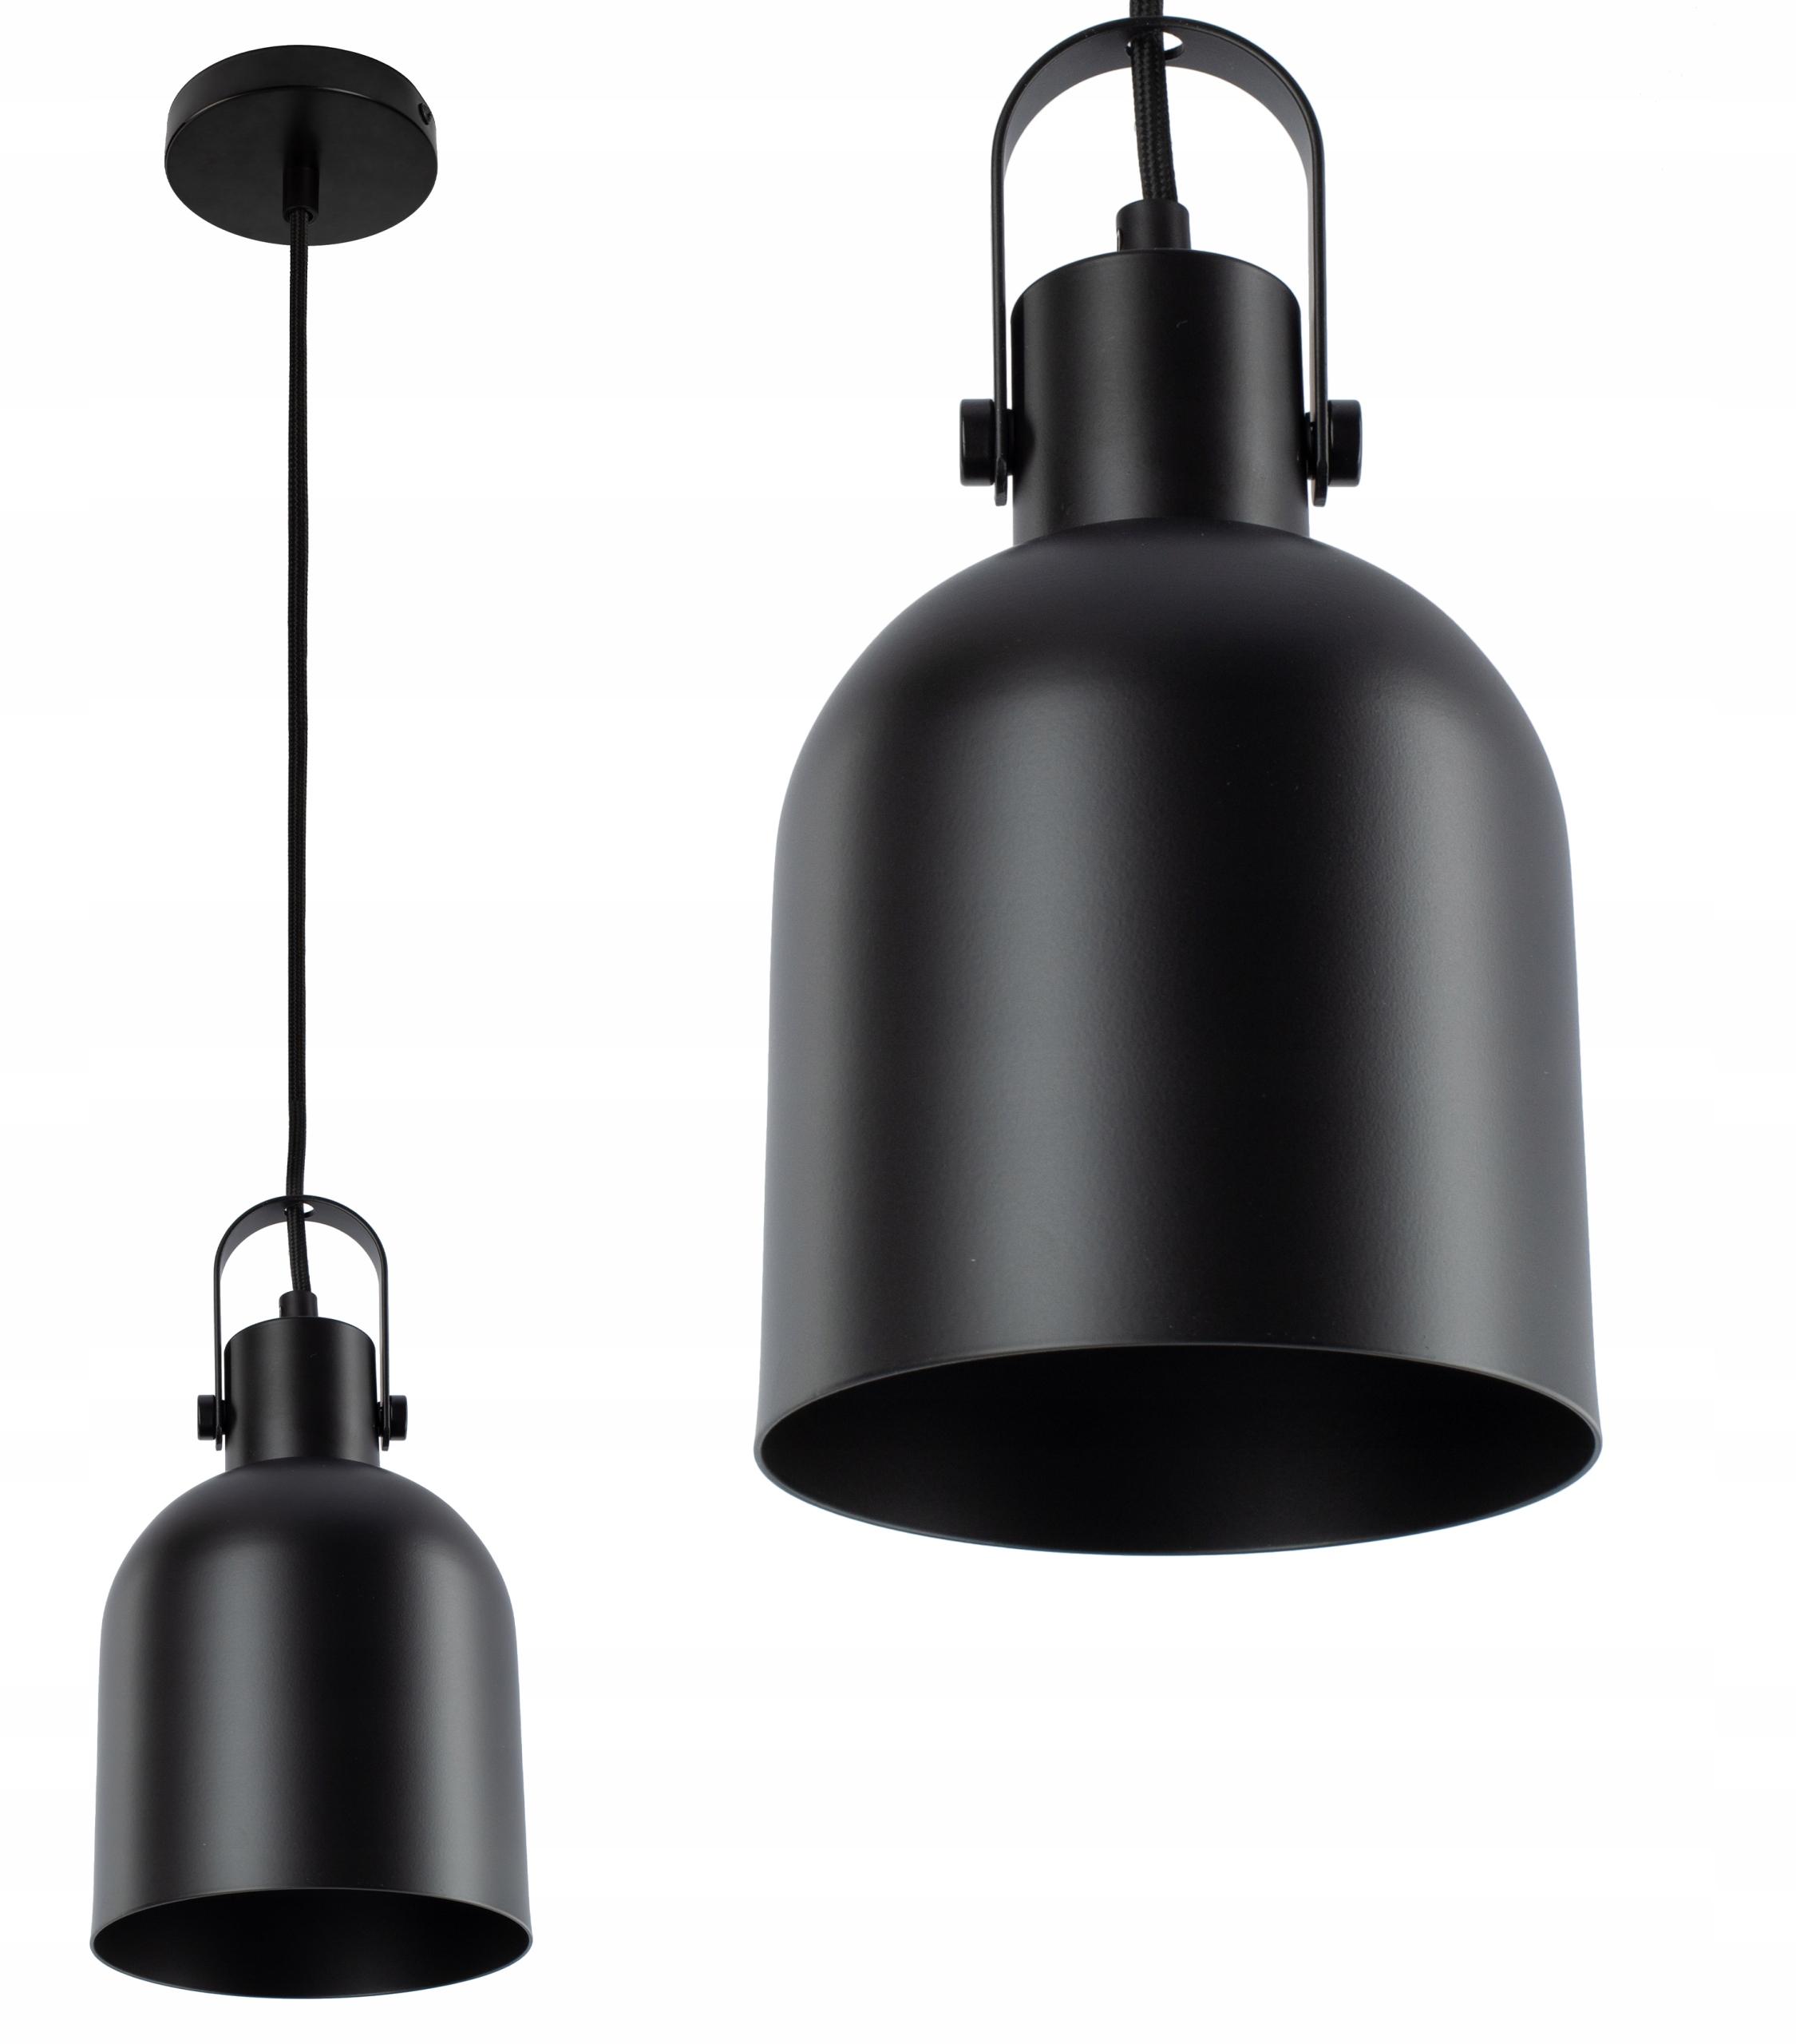 Závesné stropné svietidlo Loft RETRO luster